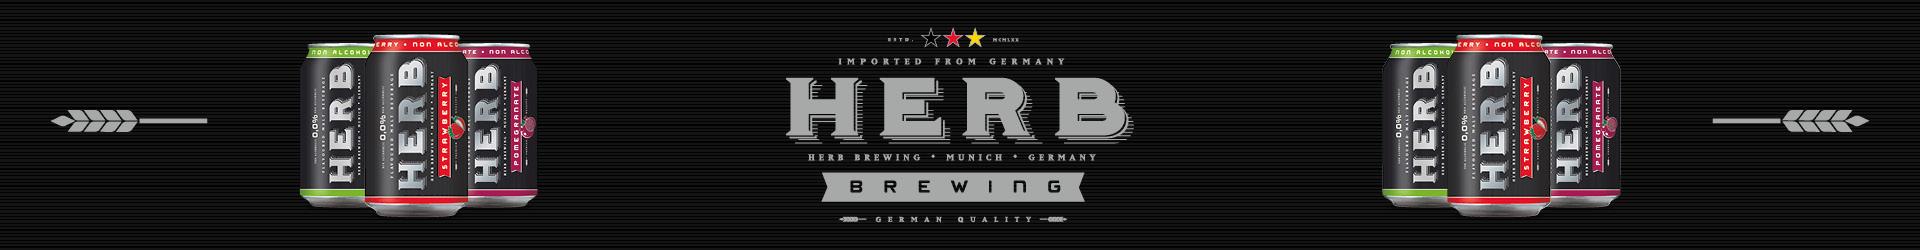 HERB Brewing